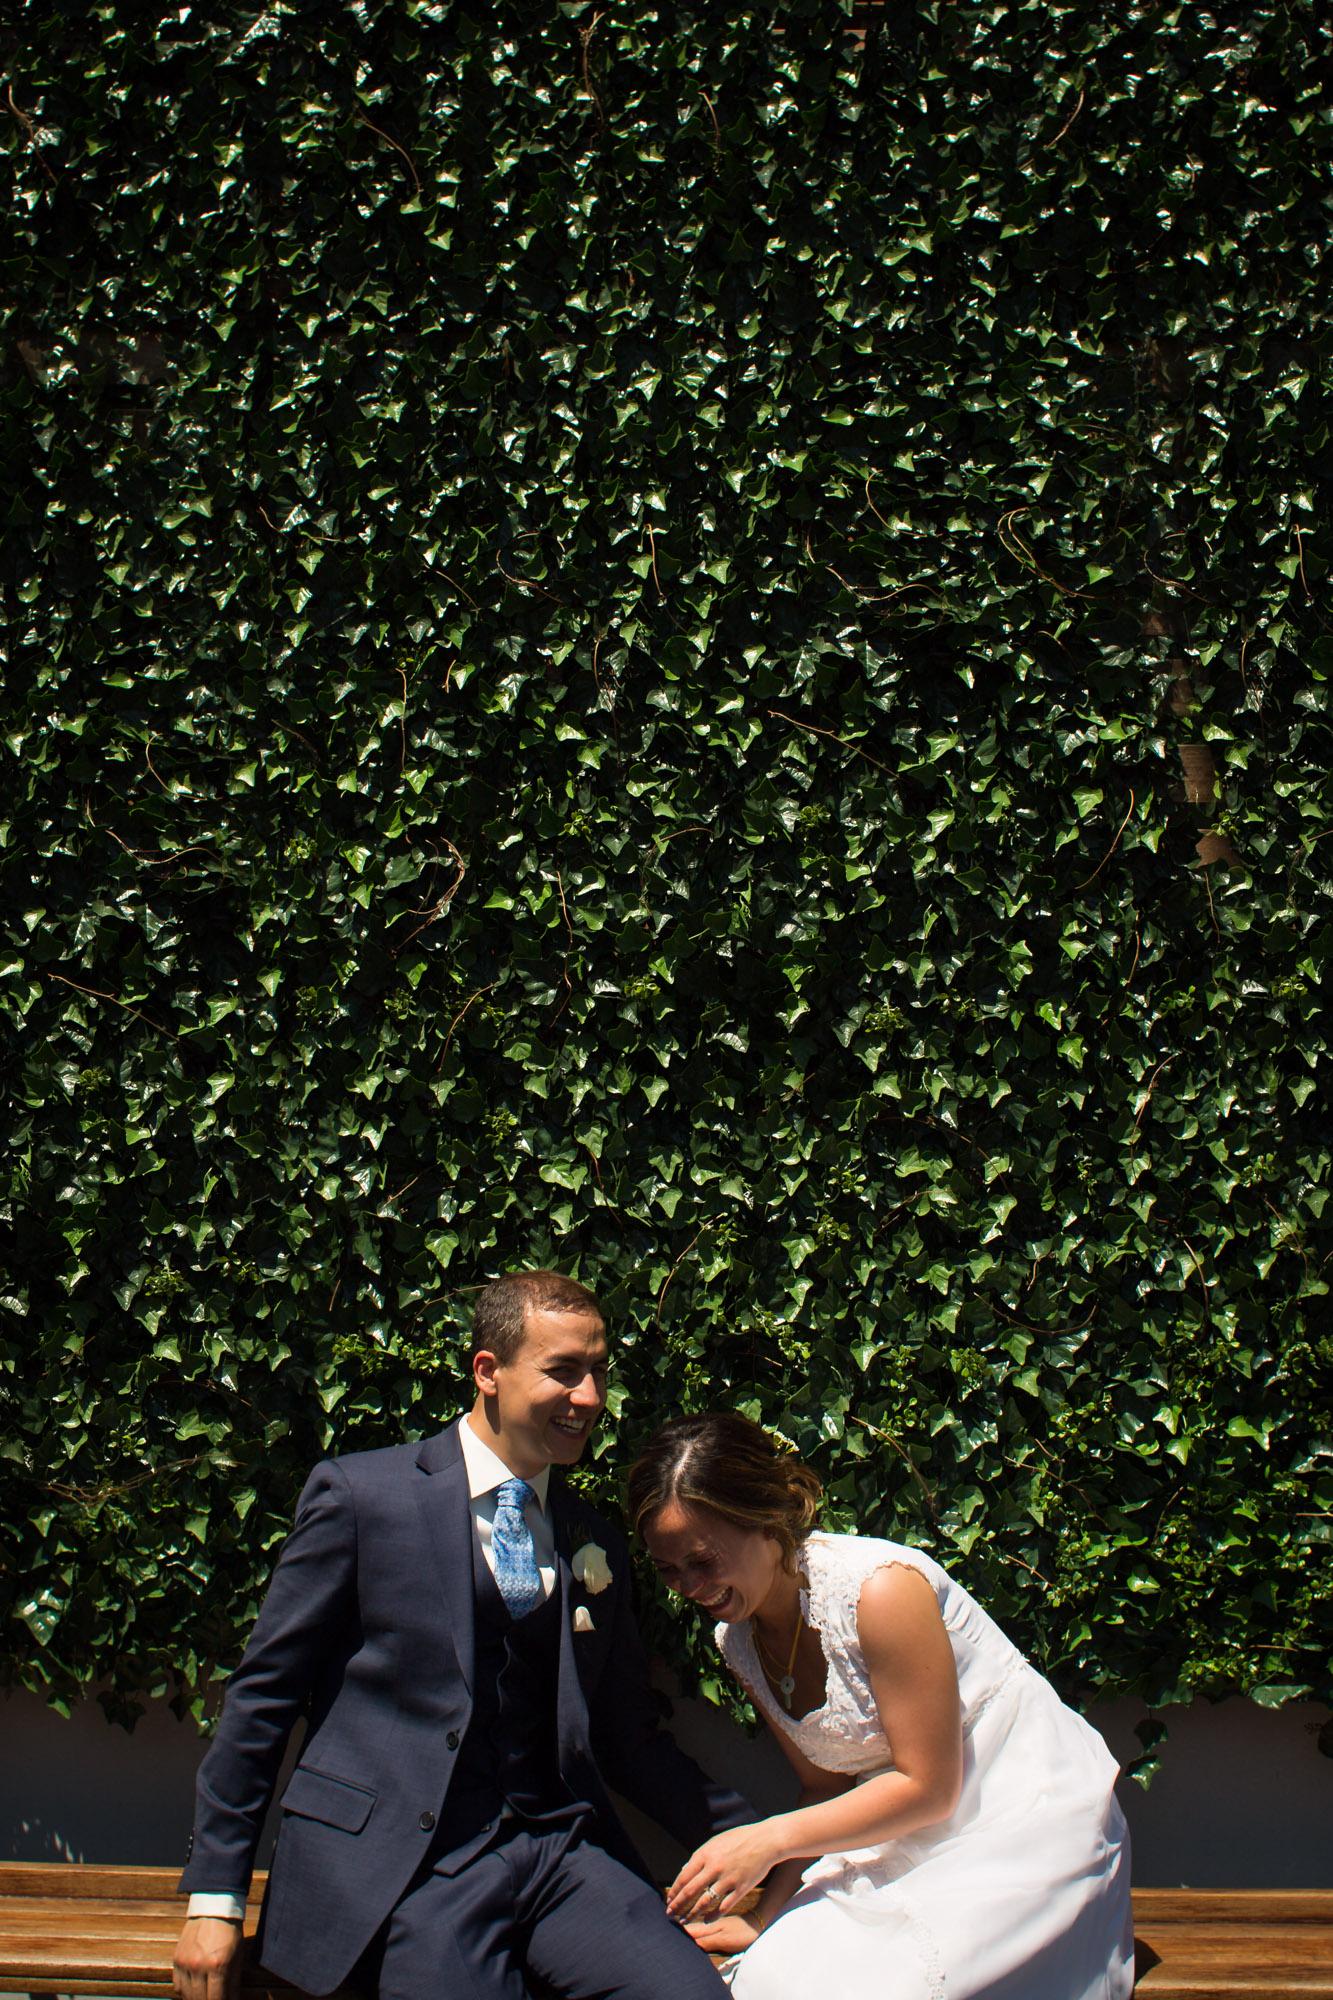 lam-chicago-wedding-photos-24.jpg